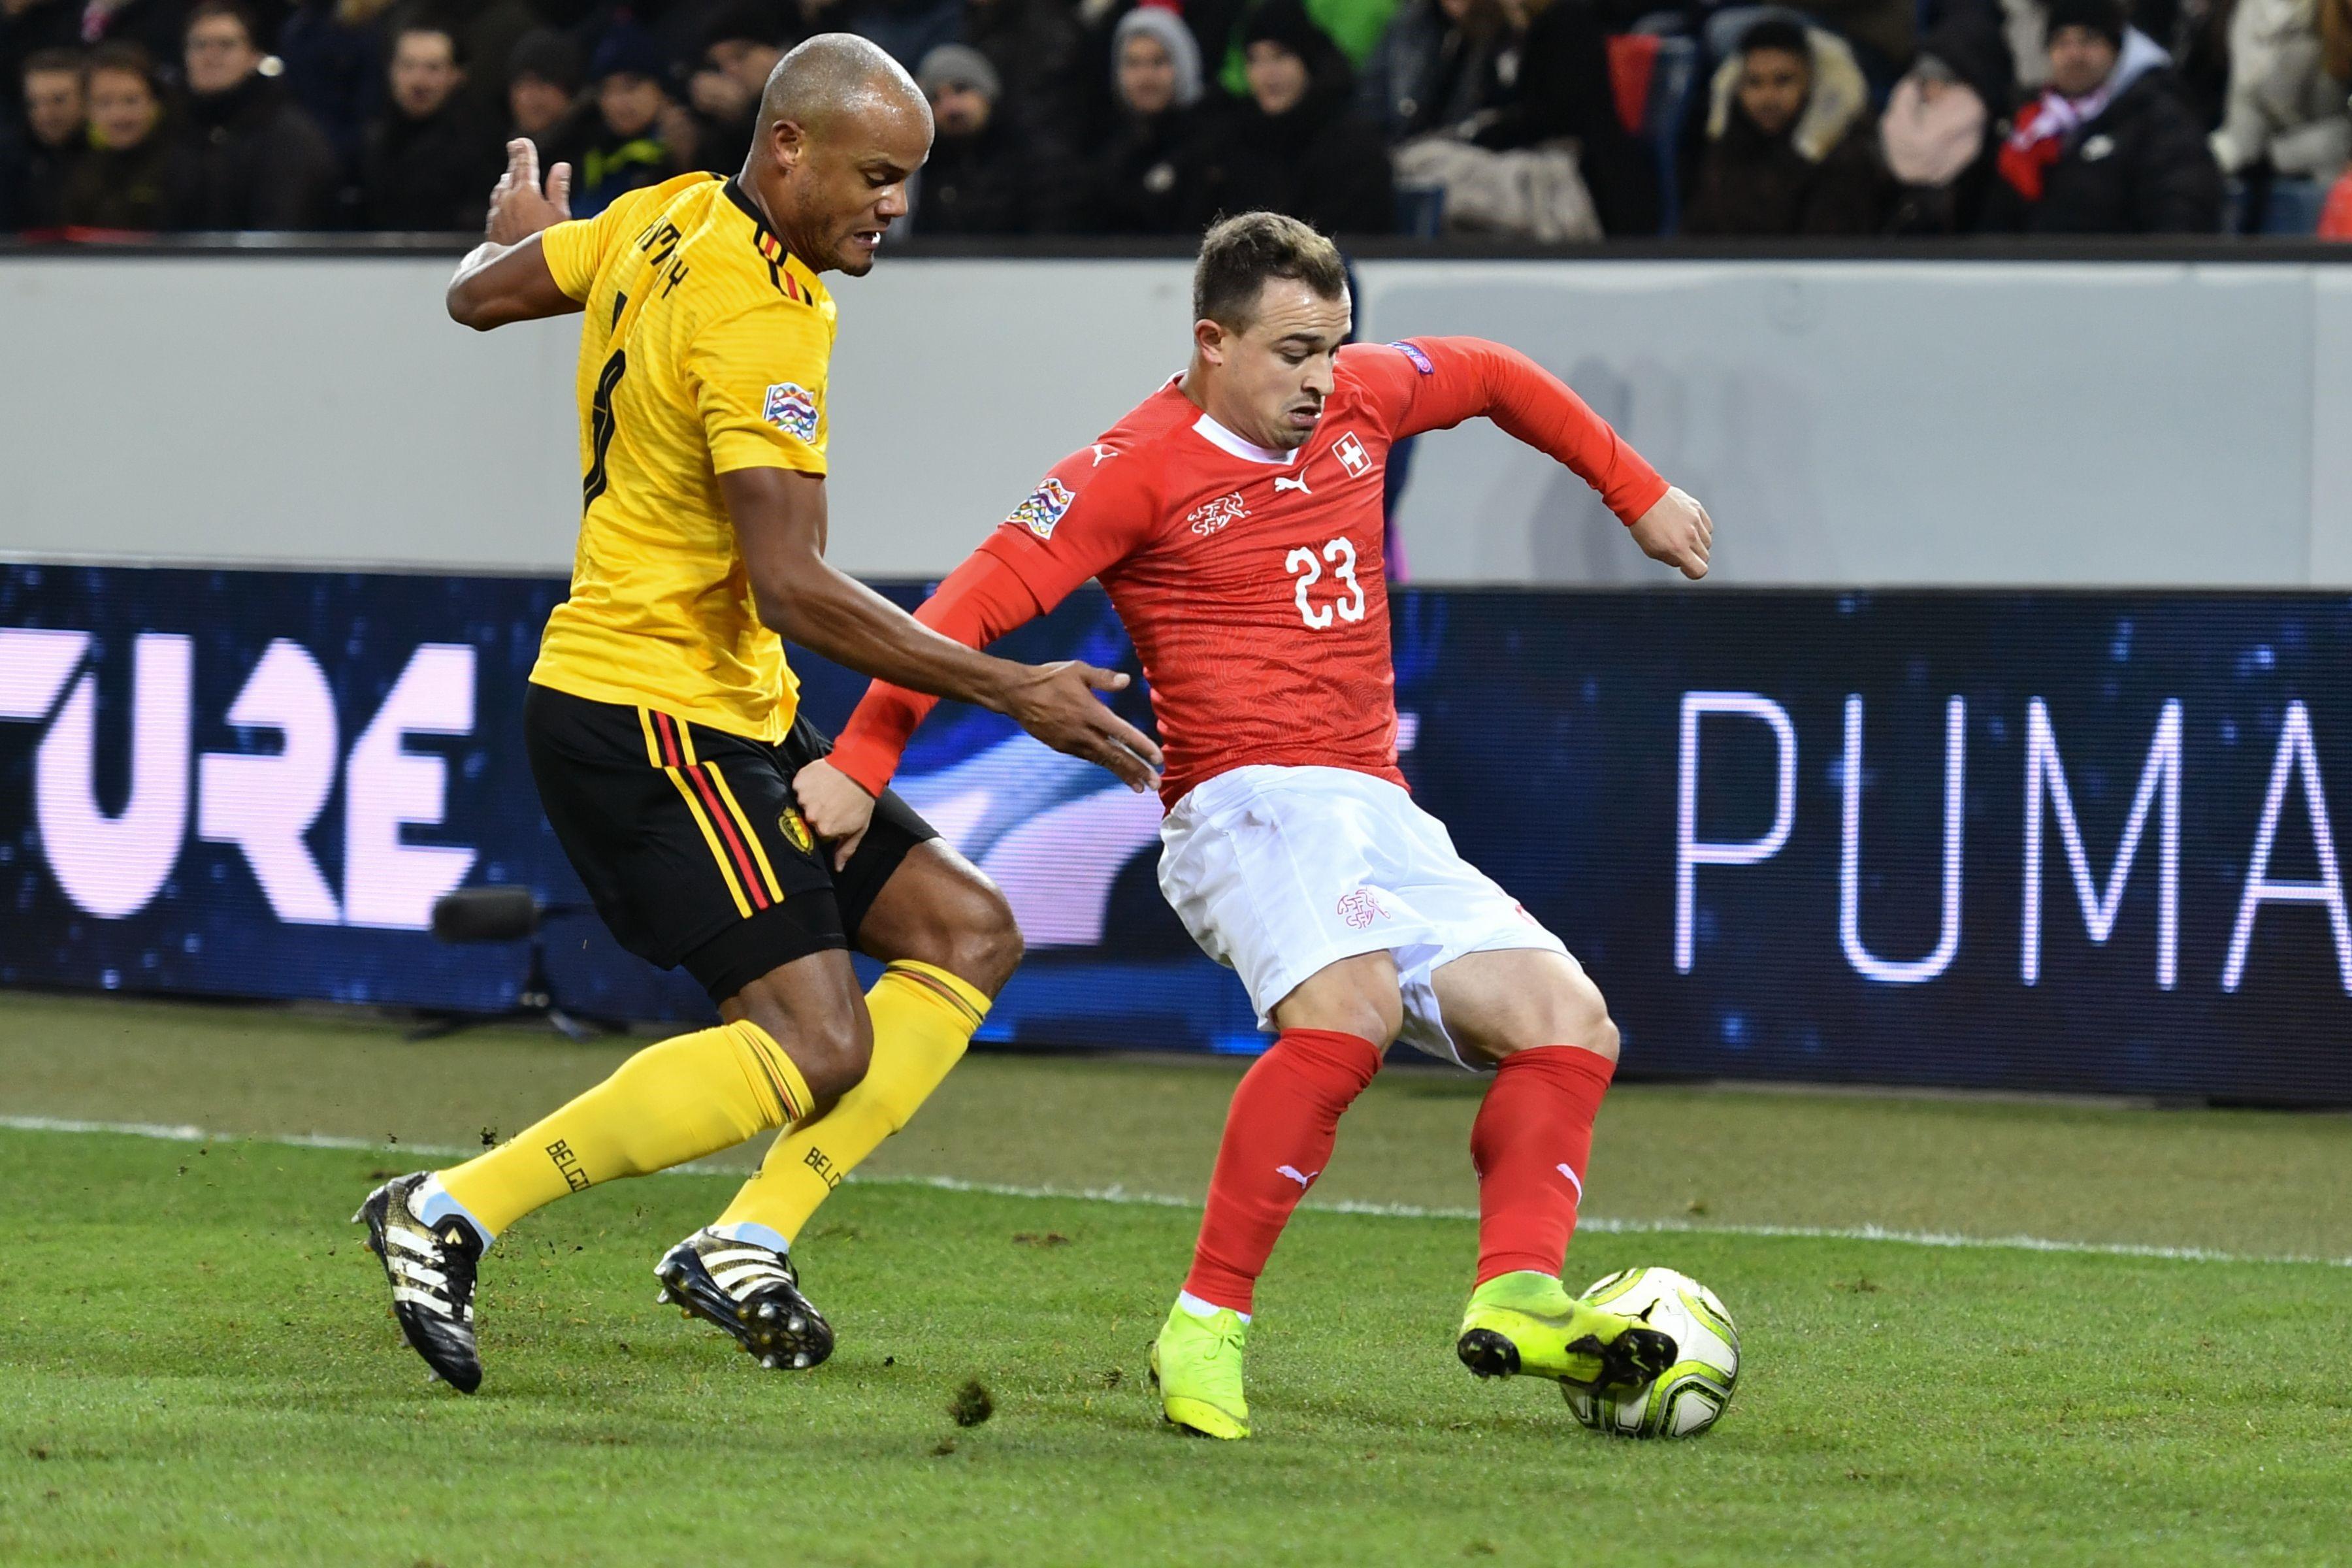 Duel entre Vincent Kompany et Xherdan Shaqiri lors de Suisse-Belgique / Ligue des nations